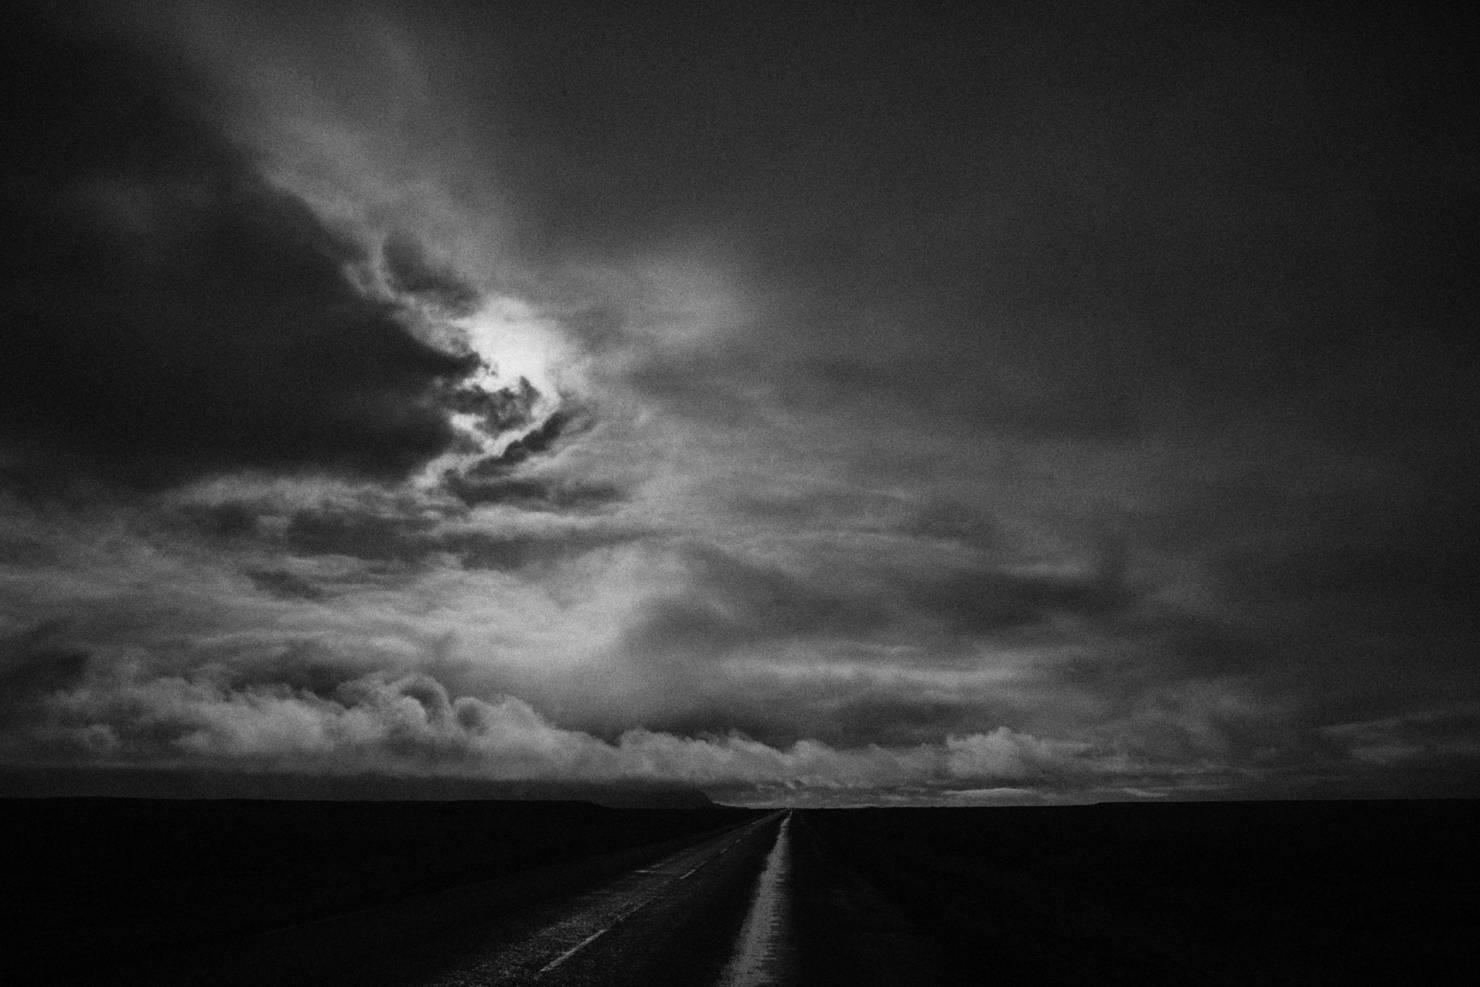 patrick_schuttler_landscape_iceland_008-ccf1fe9a5b54456cfd237b23c52d7eb7